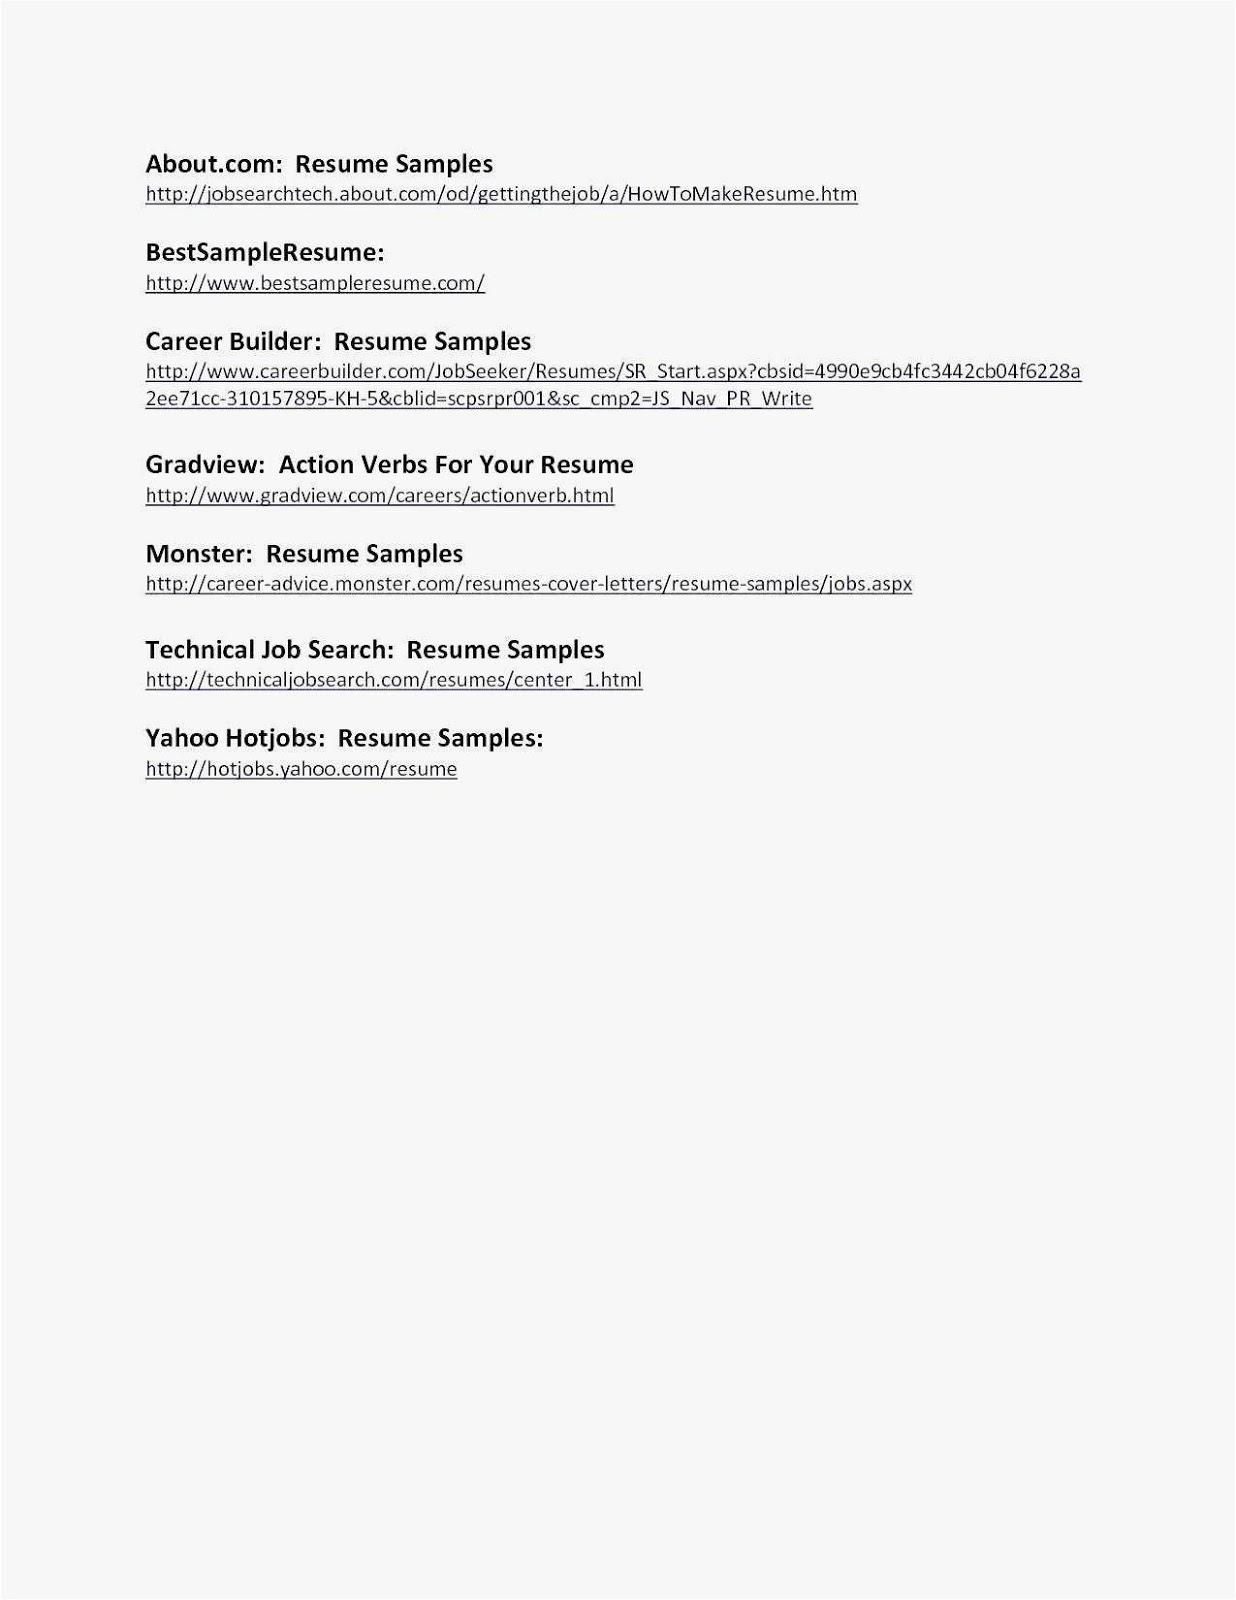 paralegal resume sample, paralegal resume samples, paralegal resume sample 2018, paralegal resume sample 2017, paralegal resume sample no experience, paralegal resume sample philippines, immigration paralegal resume sample, paralegal assistant resume sample, paralegal resume examples, paralegal resume examples 2019,